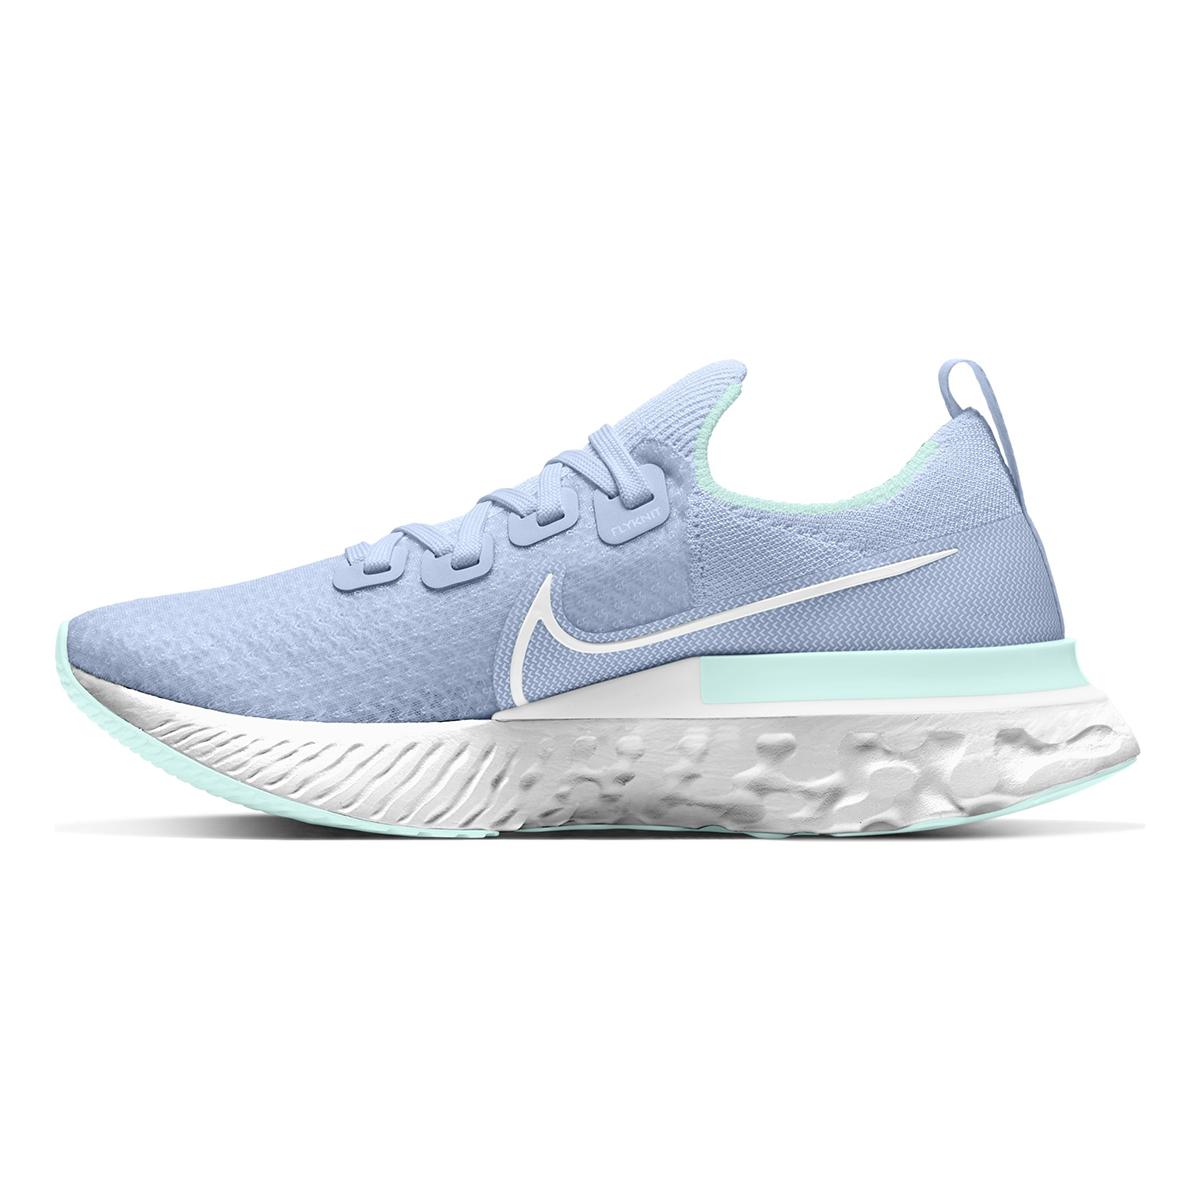 Women's Nike React Infinity Run Flyknit Running Shoe - Color: Hydrogen Blue/Teal Tint/Metallic Silver/White (Regular Width) - Size: 5, Hydrogen Blue/Teal Tint/Metallic Silver/White, large, image 2